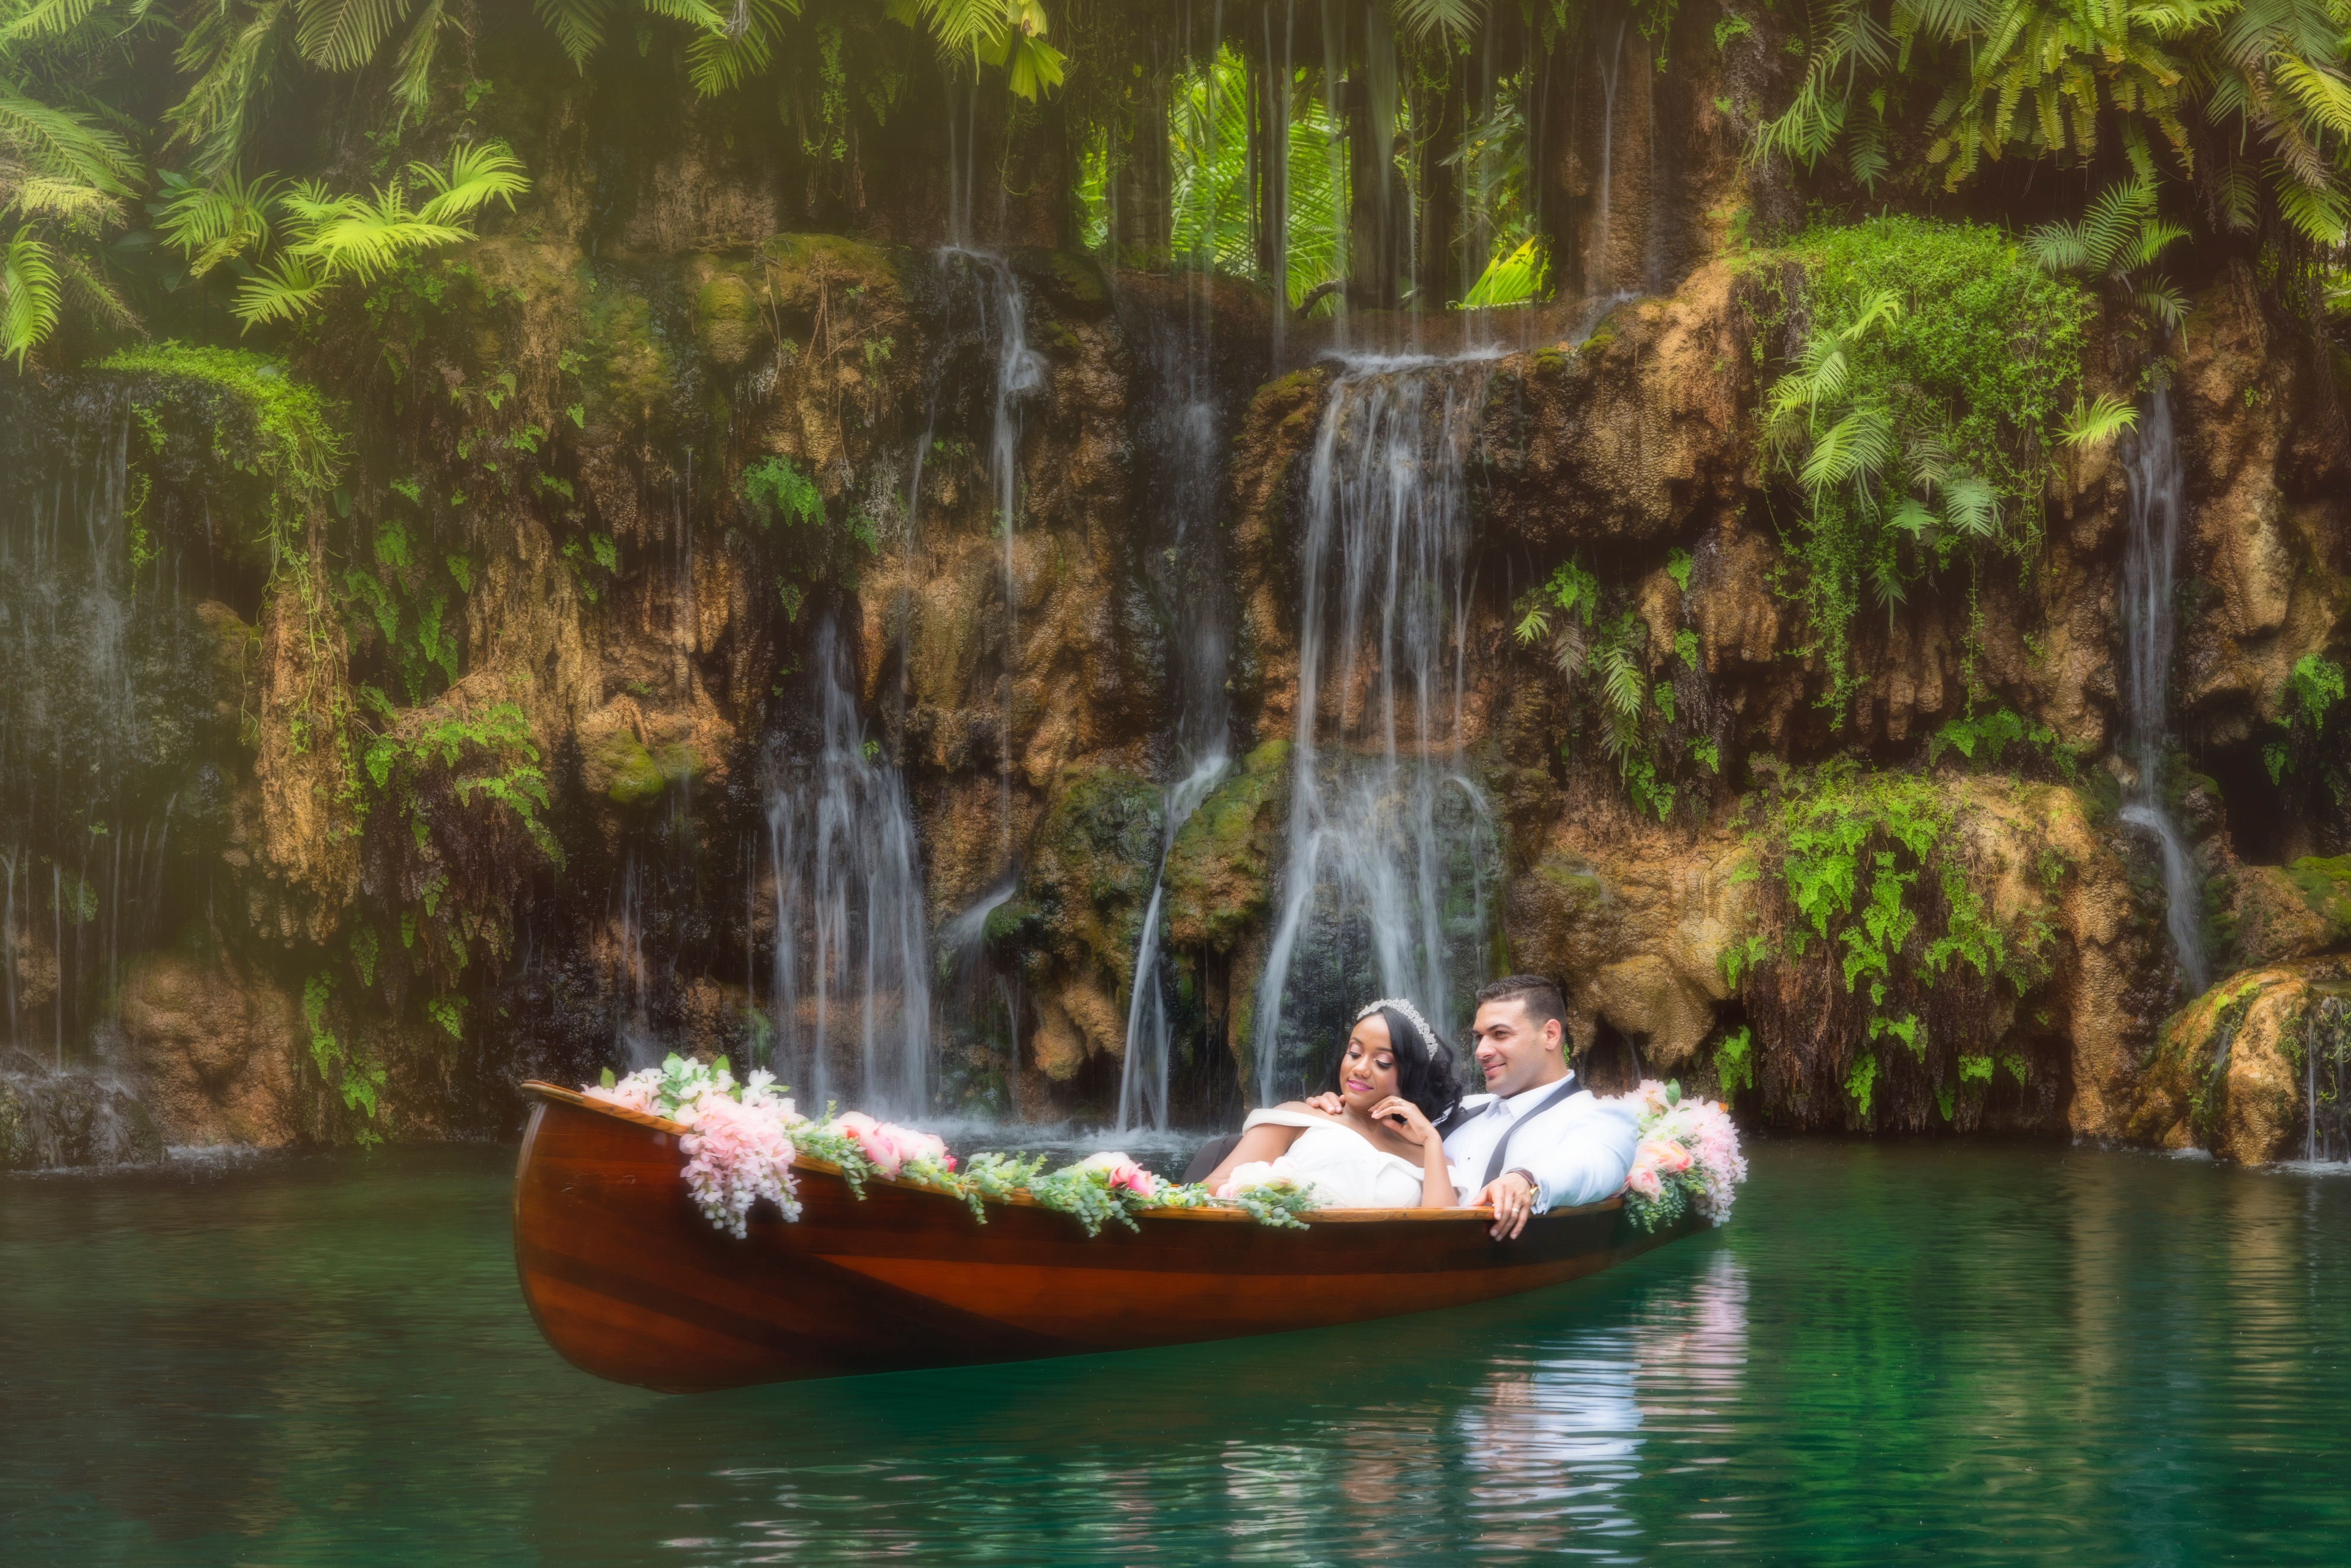 wedding photography in a canoe